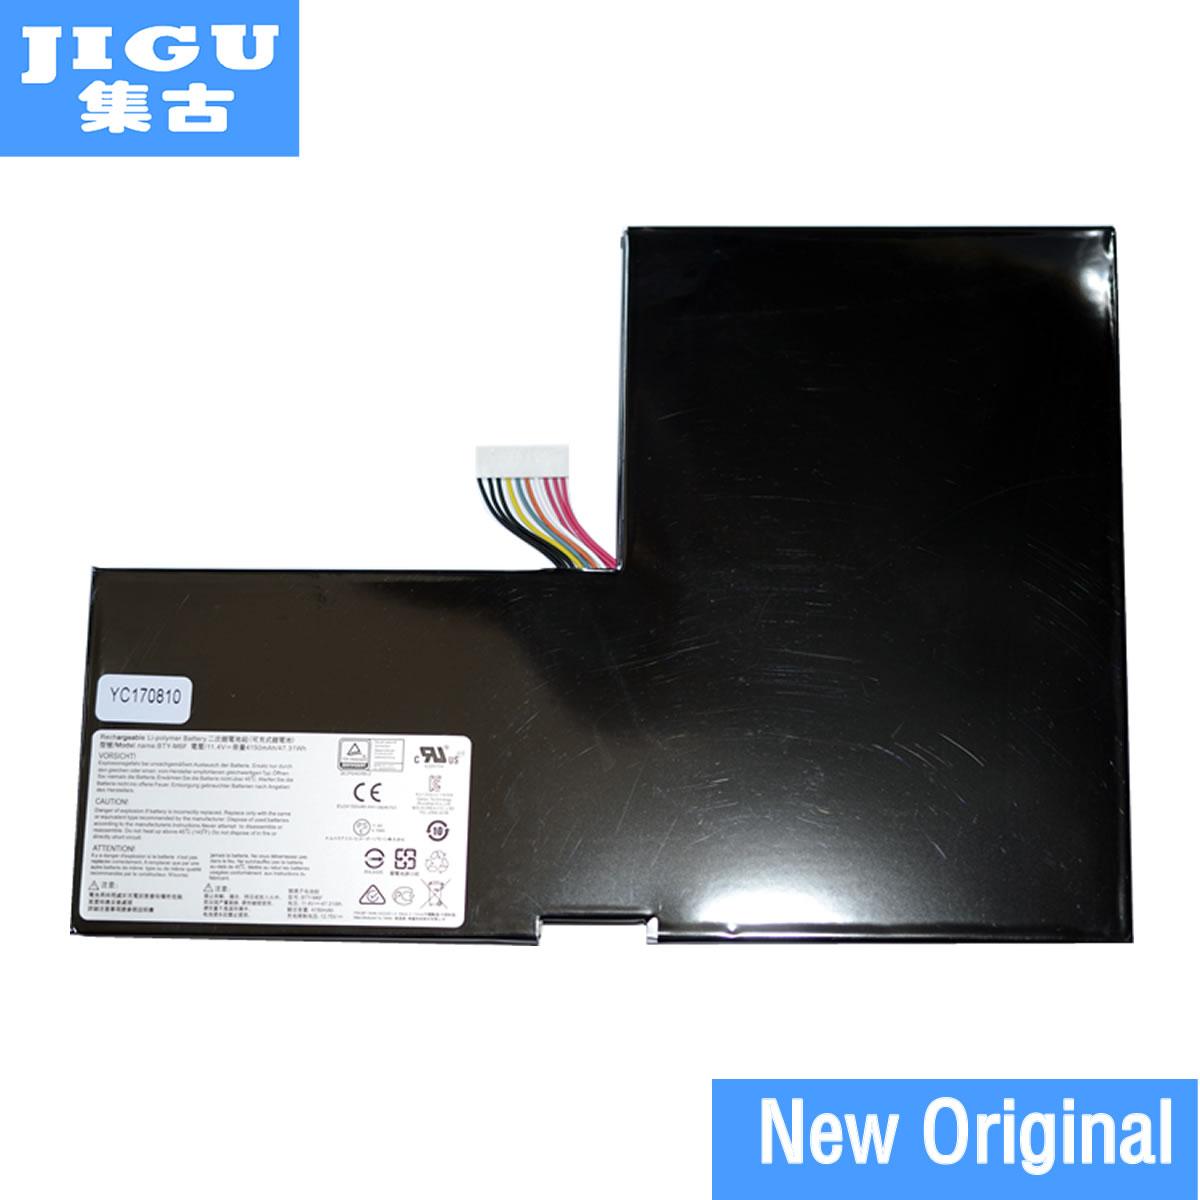 JIGU BTY-M6F MS-16H2 Original Laptop Battery For MSI 16H2 GS60 PX60 2PL 2PC 2PE 2QC 2QD 2QE 6QC 6QE BTY-M6F Batteries laptop keyboard for msi gp60 2od 026us 2od 052us english 2od 070us 2od 038be 2od 068be belgium 2pe 023xtr turkey 2pe 011cz